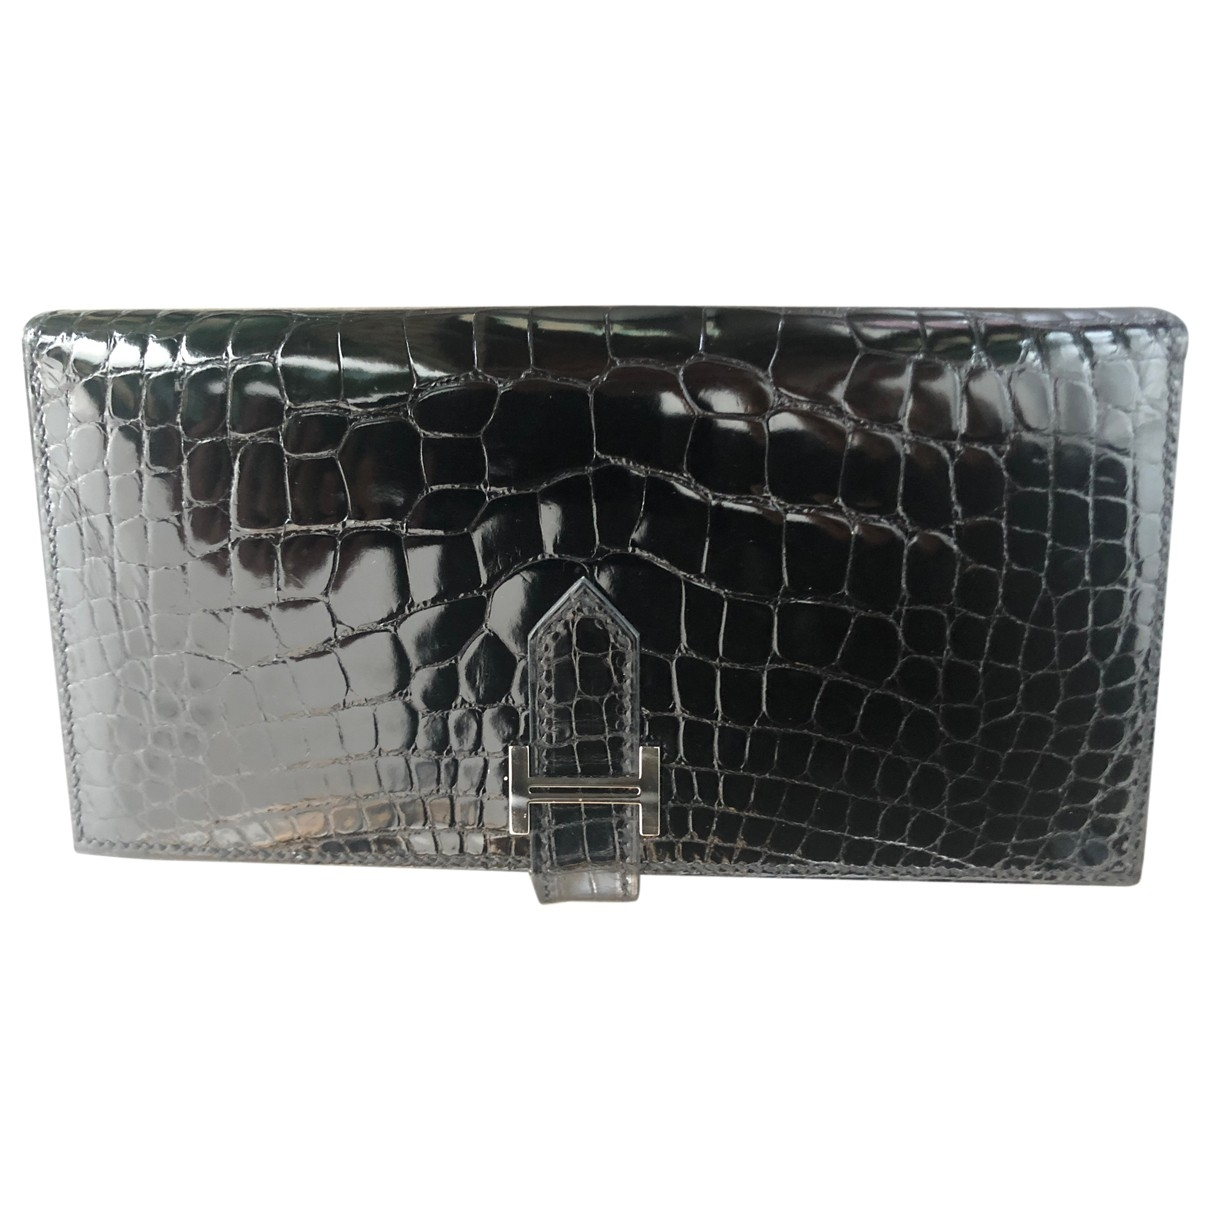 Hermes Bearn Portemonnaie in  Schwarz Aligator